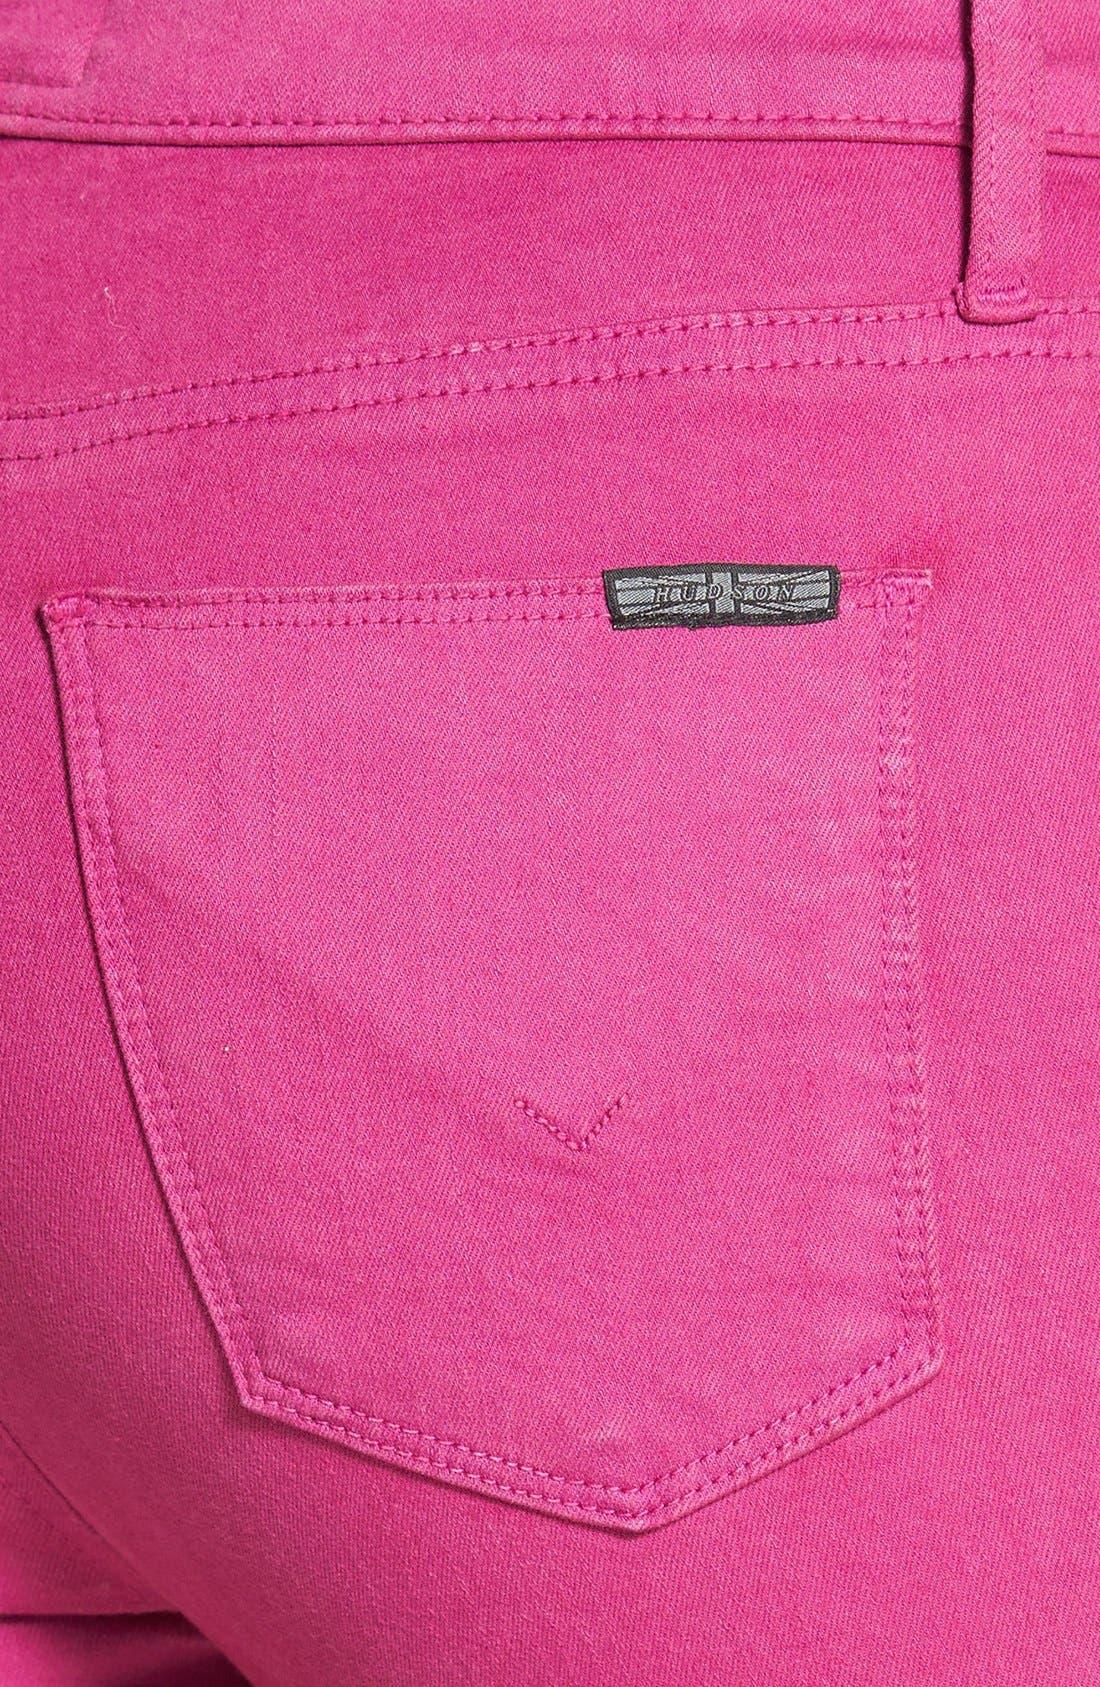 Alternate Image 3  - Hudson Jeans 'Krista' Super Skinny Jeans (Bright Hydrangea)